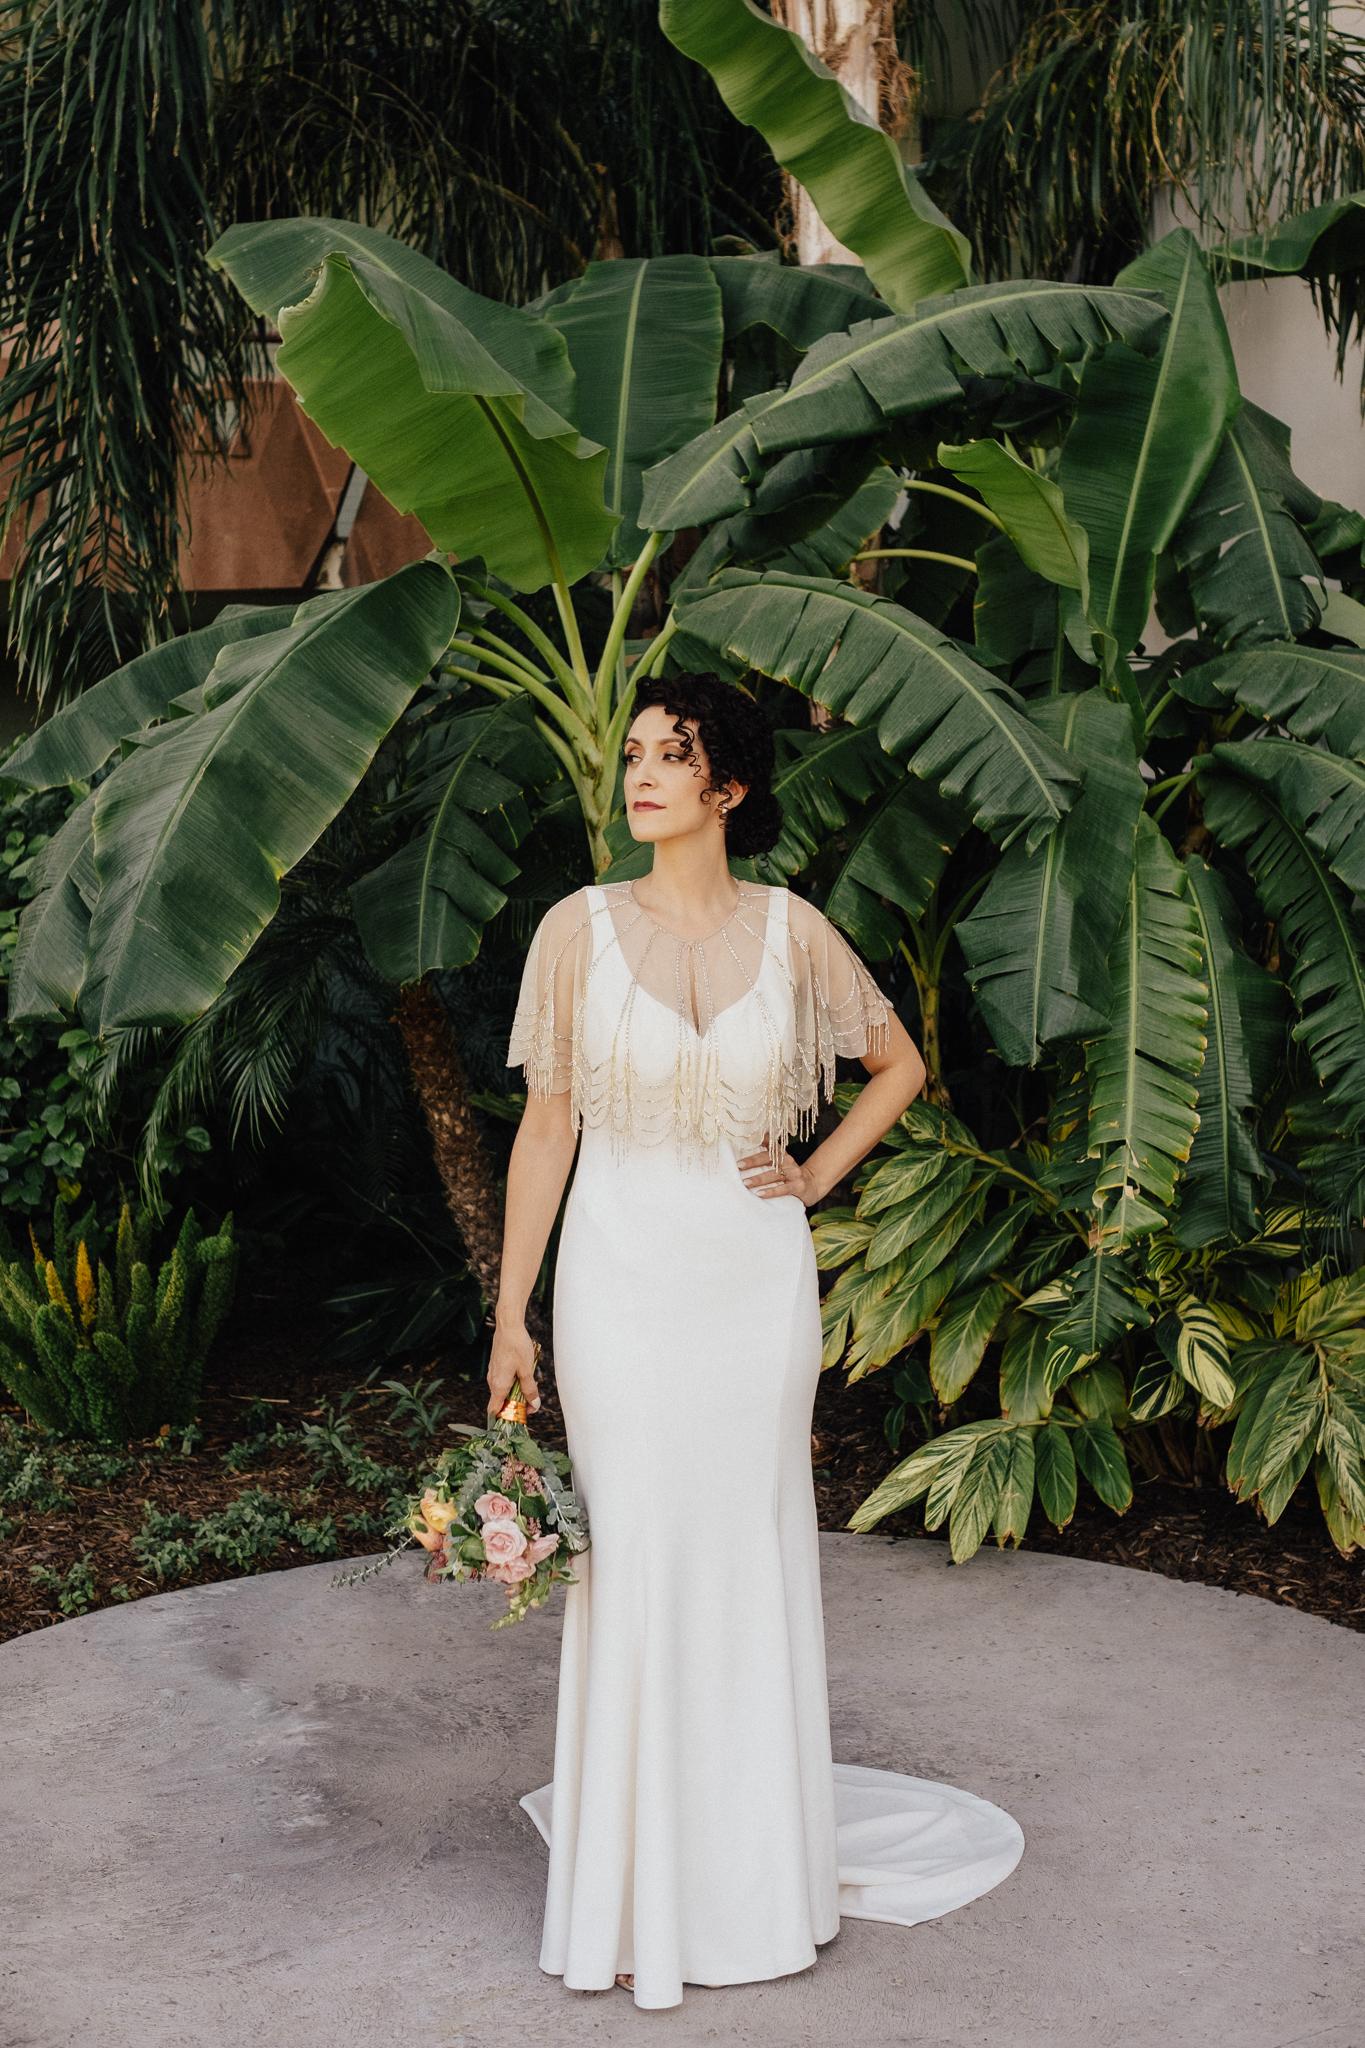 Arizona-Adventure-Elopement-Wedding-Photographer-120.jpg